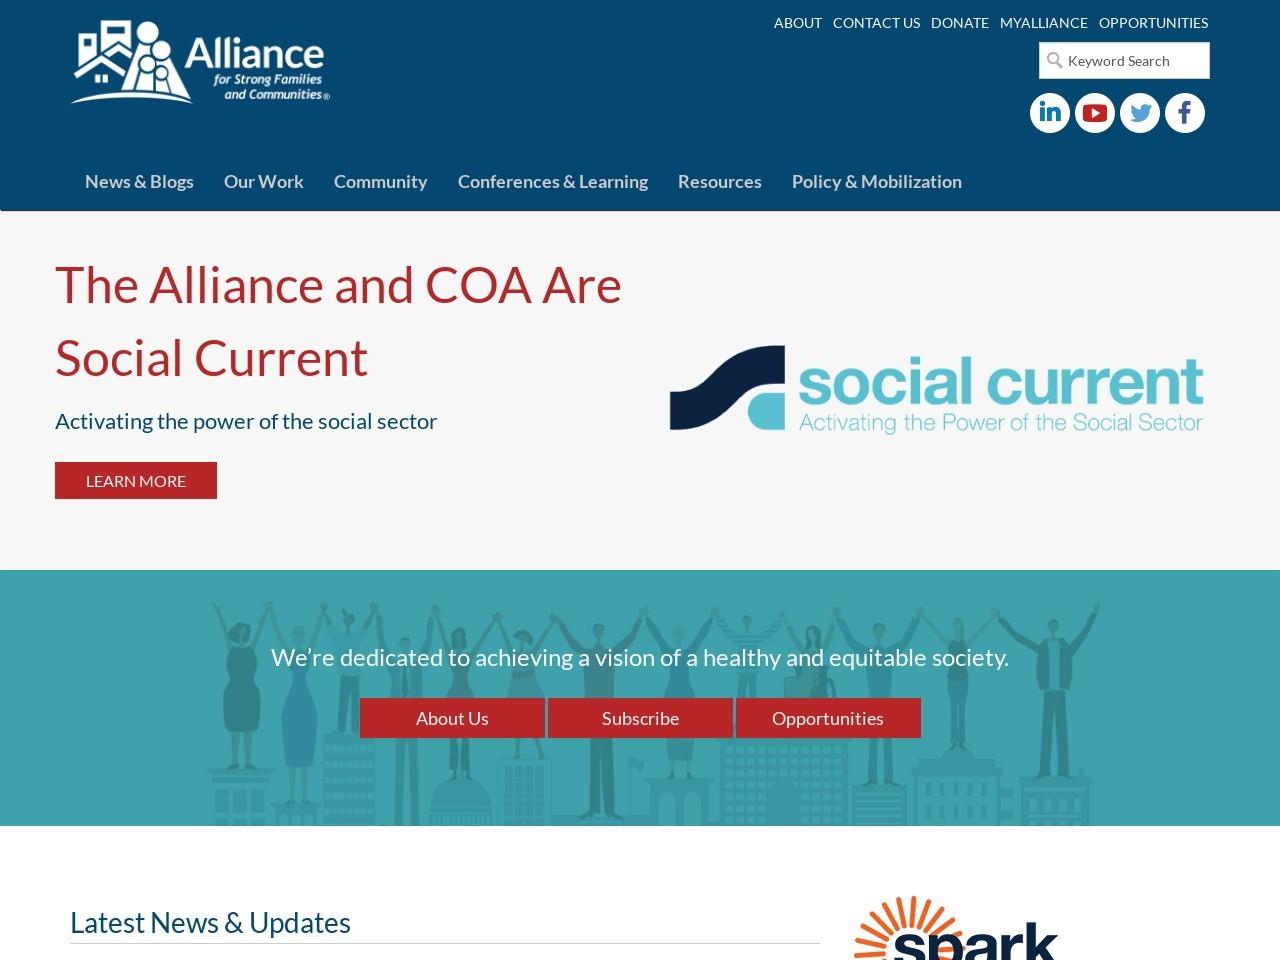 alliance1.org